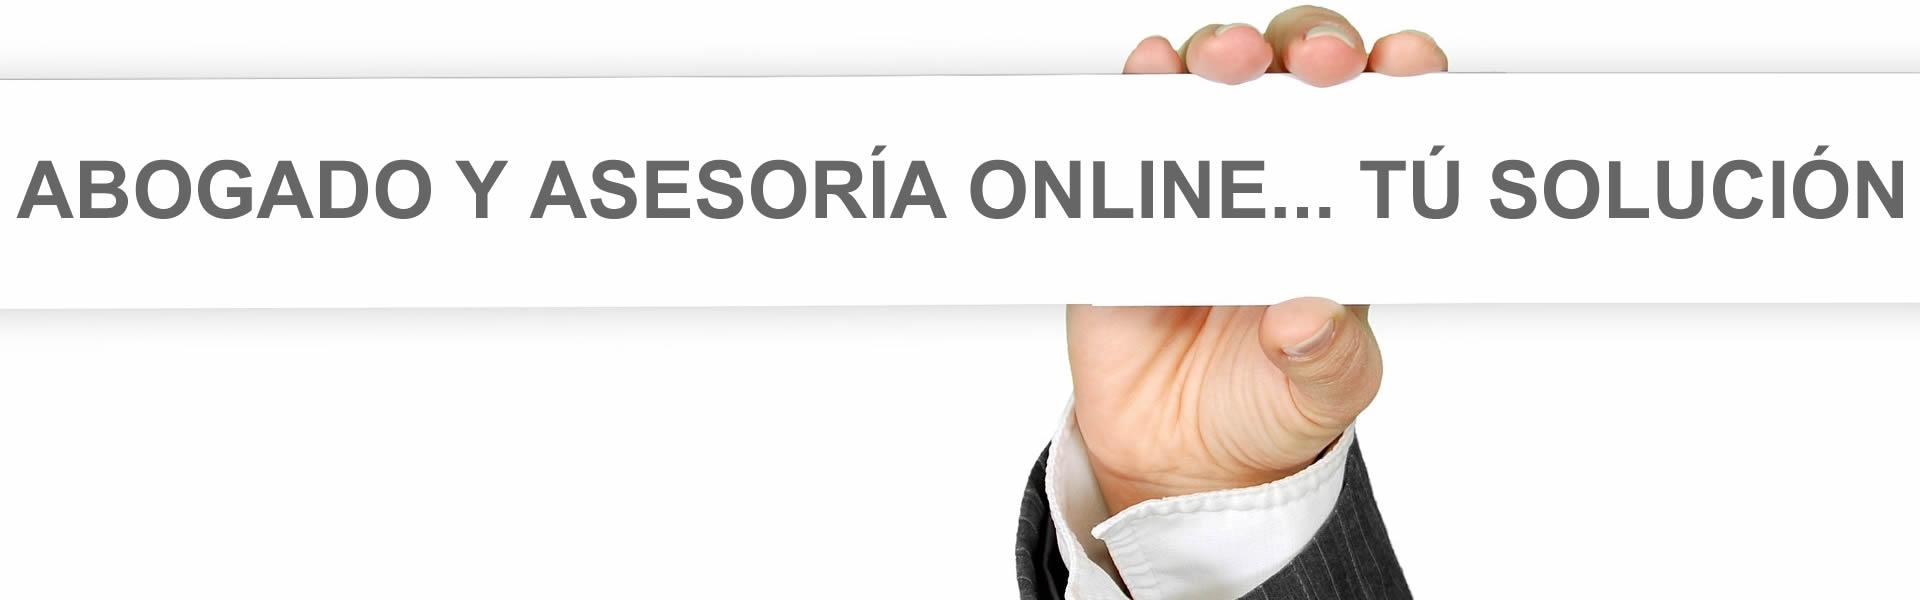 Abogado asesoría online